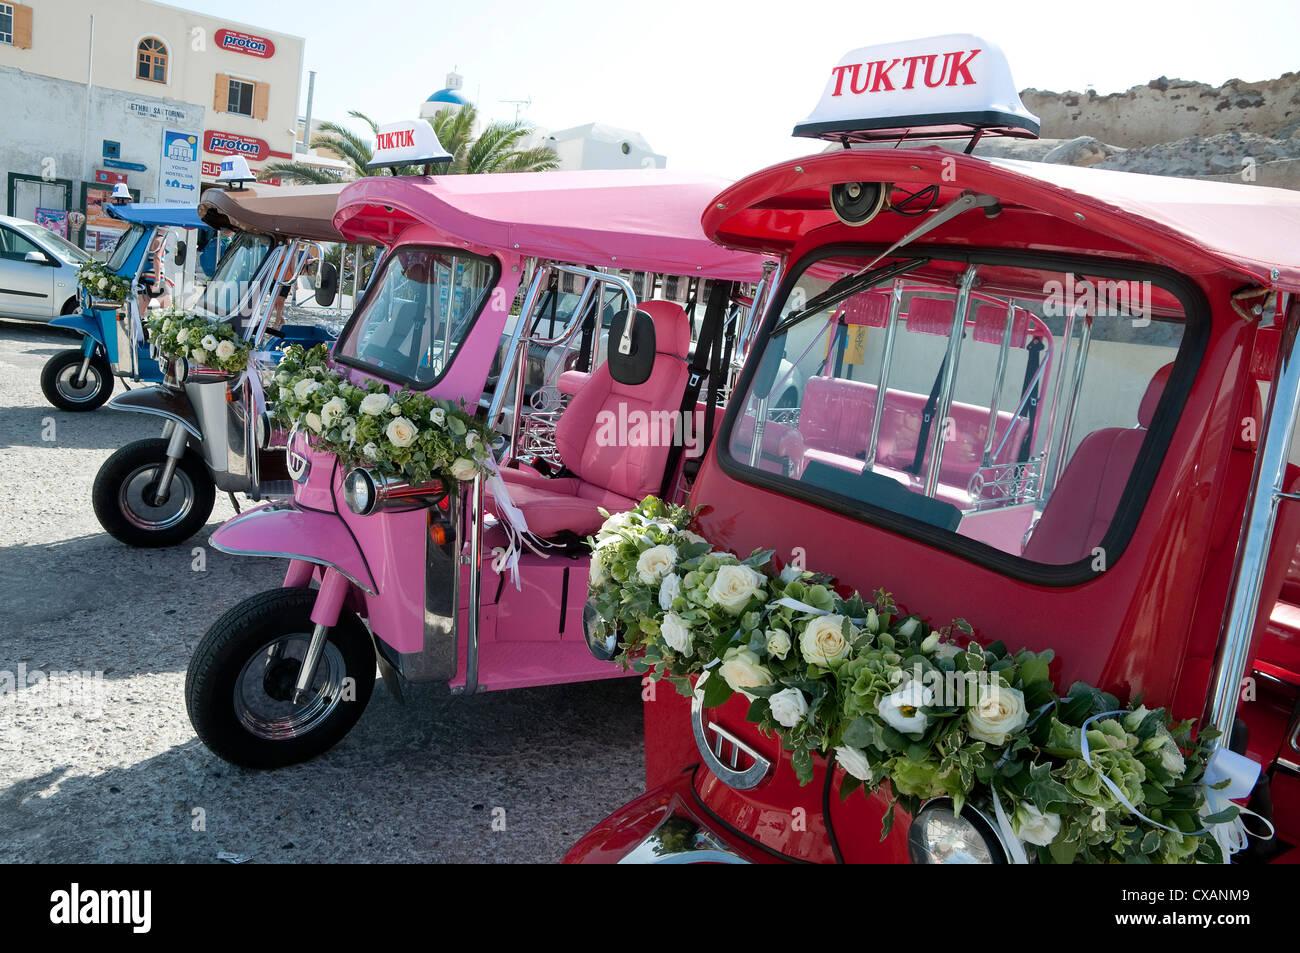 colourful wedding tuk tuk motor vehicles, oia, santorini, greece - Stock Image